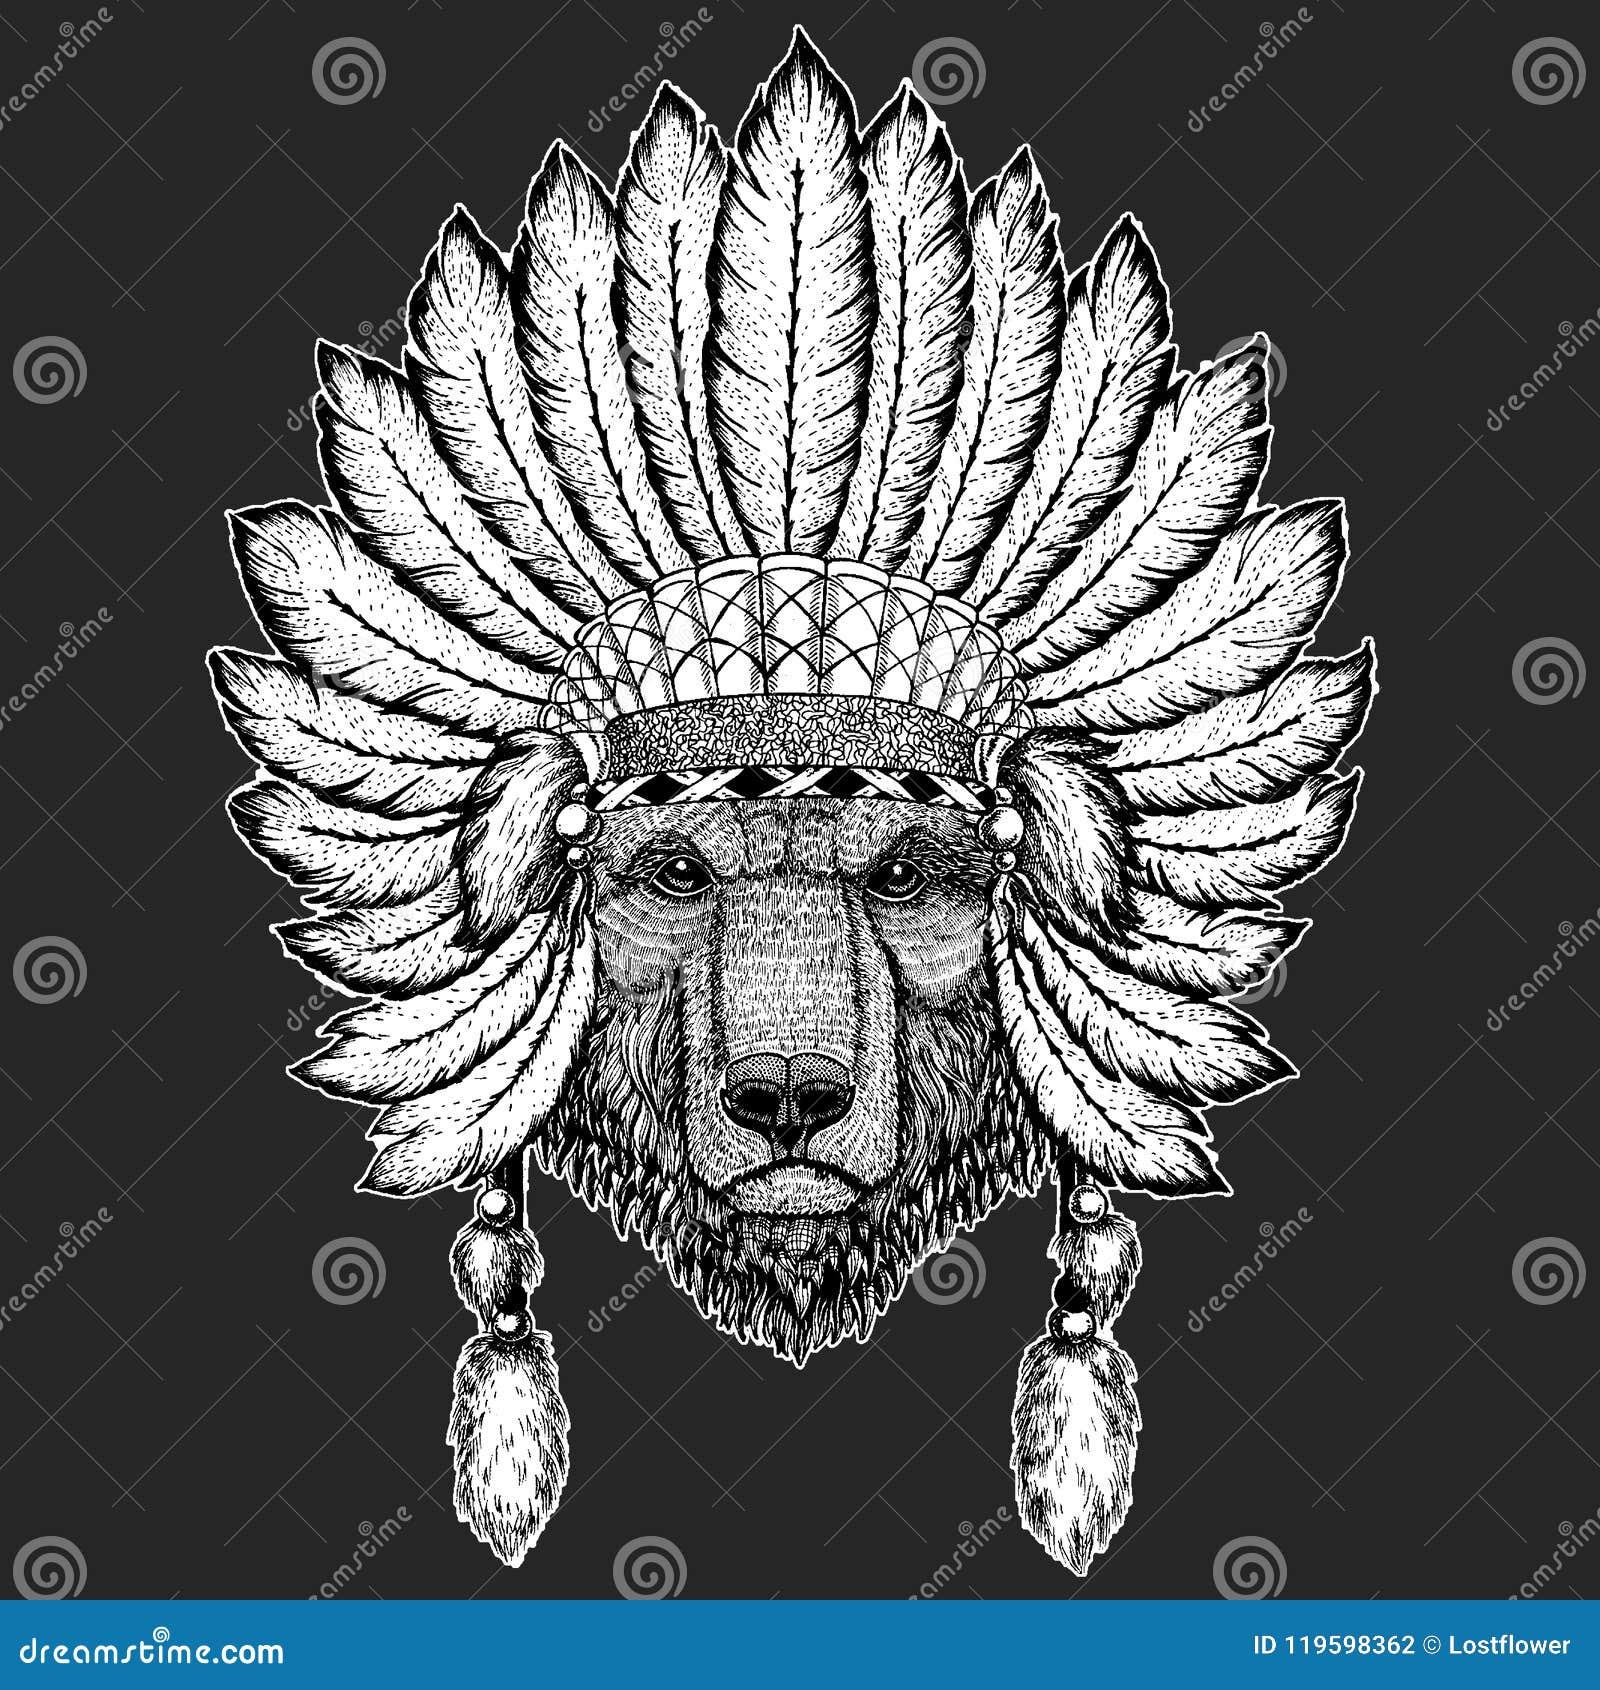 e851585e82716 Brown bear Russian bear Hand drawn image for tattoo, t-shirt, emblem,  badge, logo, patch